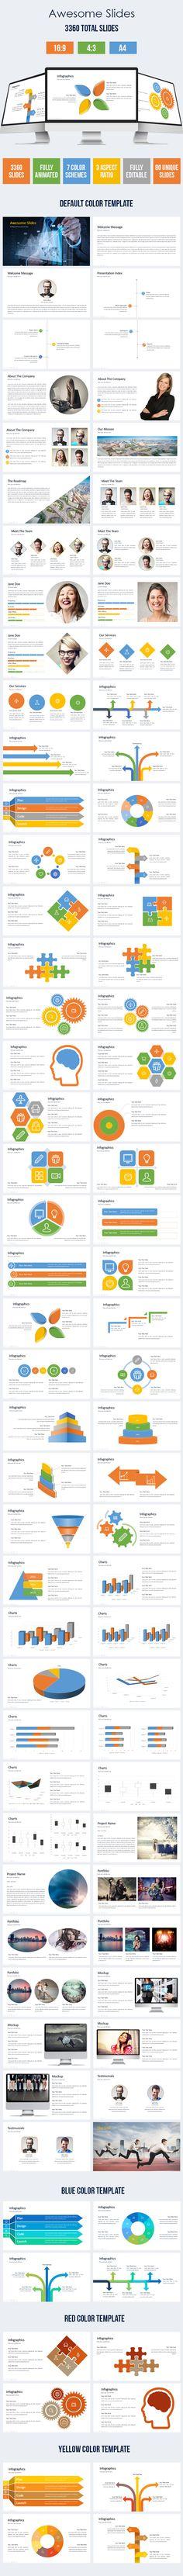 Profitable Multipurpose Powerpoint Template Template - Awesome logo presentation template scheme